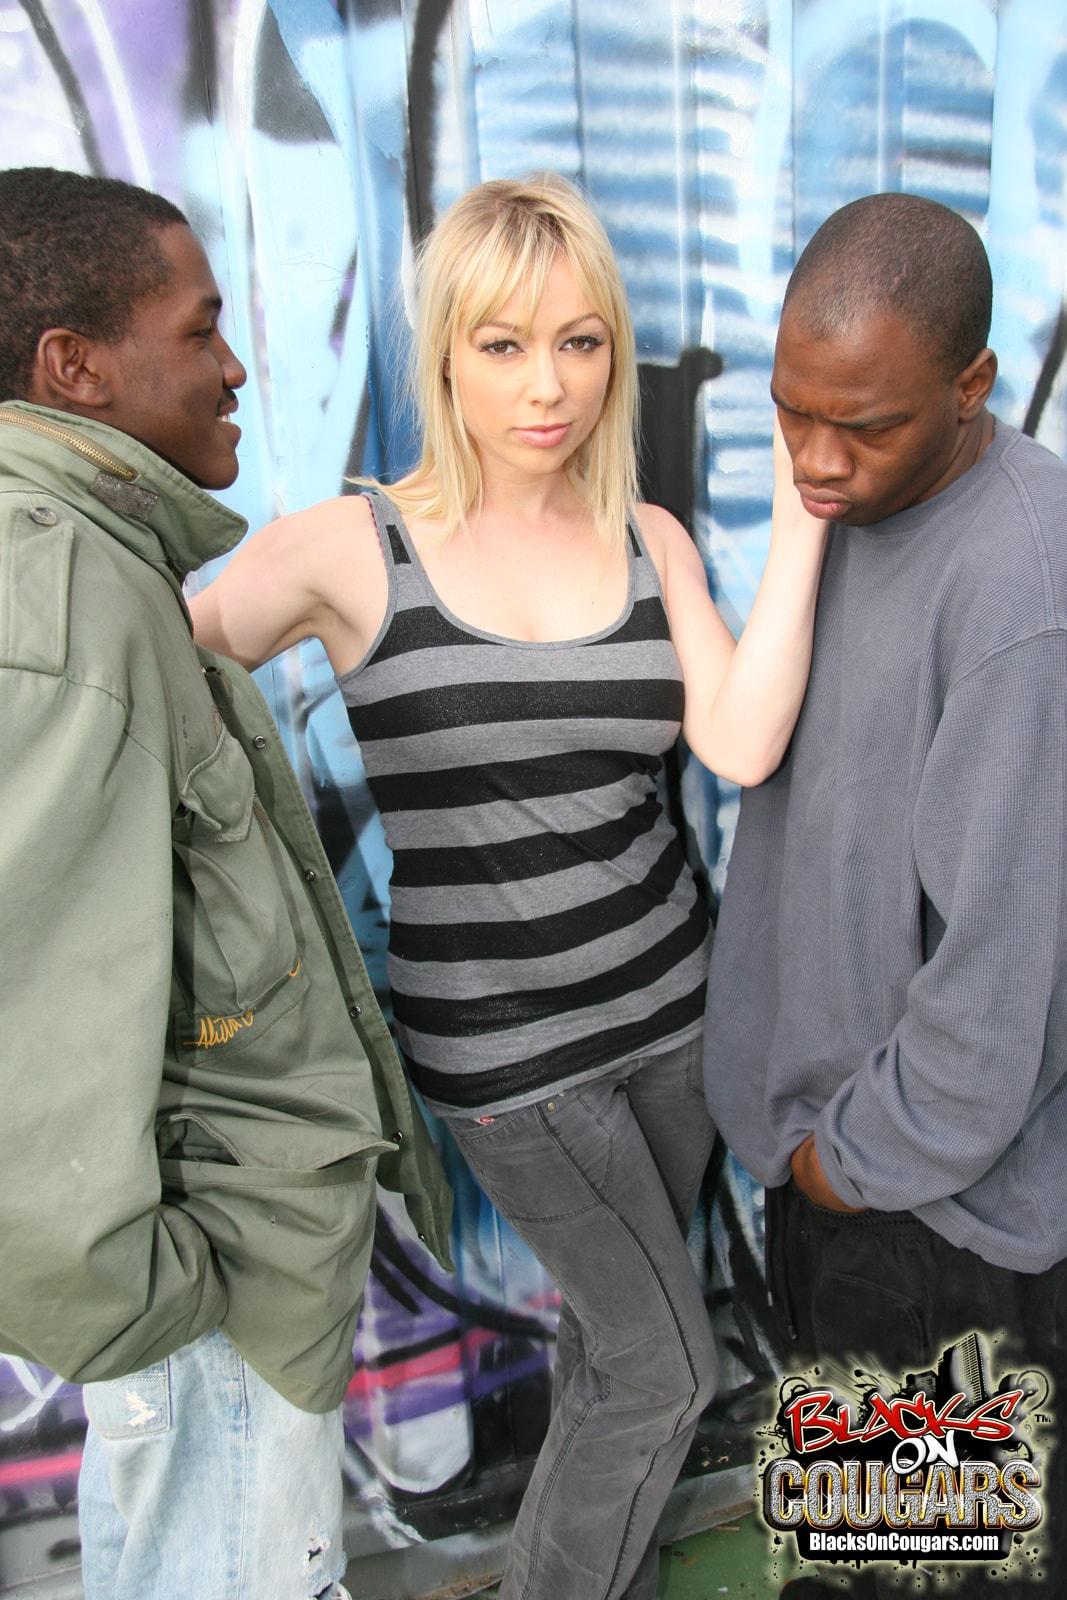 Dogfart '- Blacks On Cougars' starring Adrianna Nicole (Photo 1)